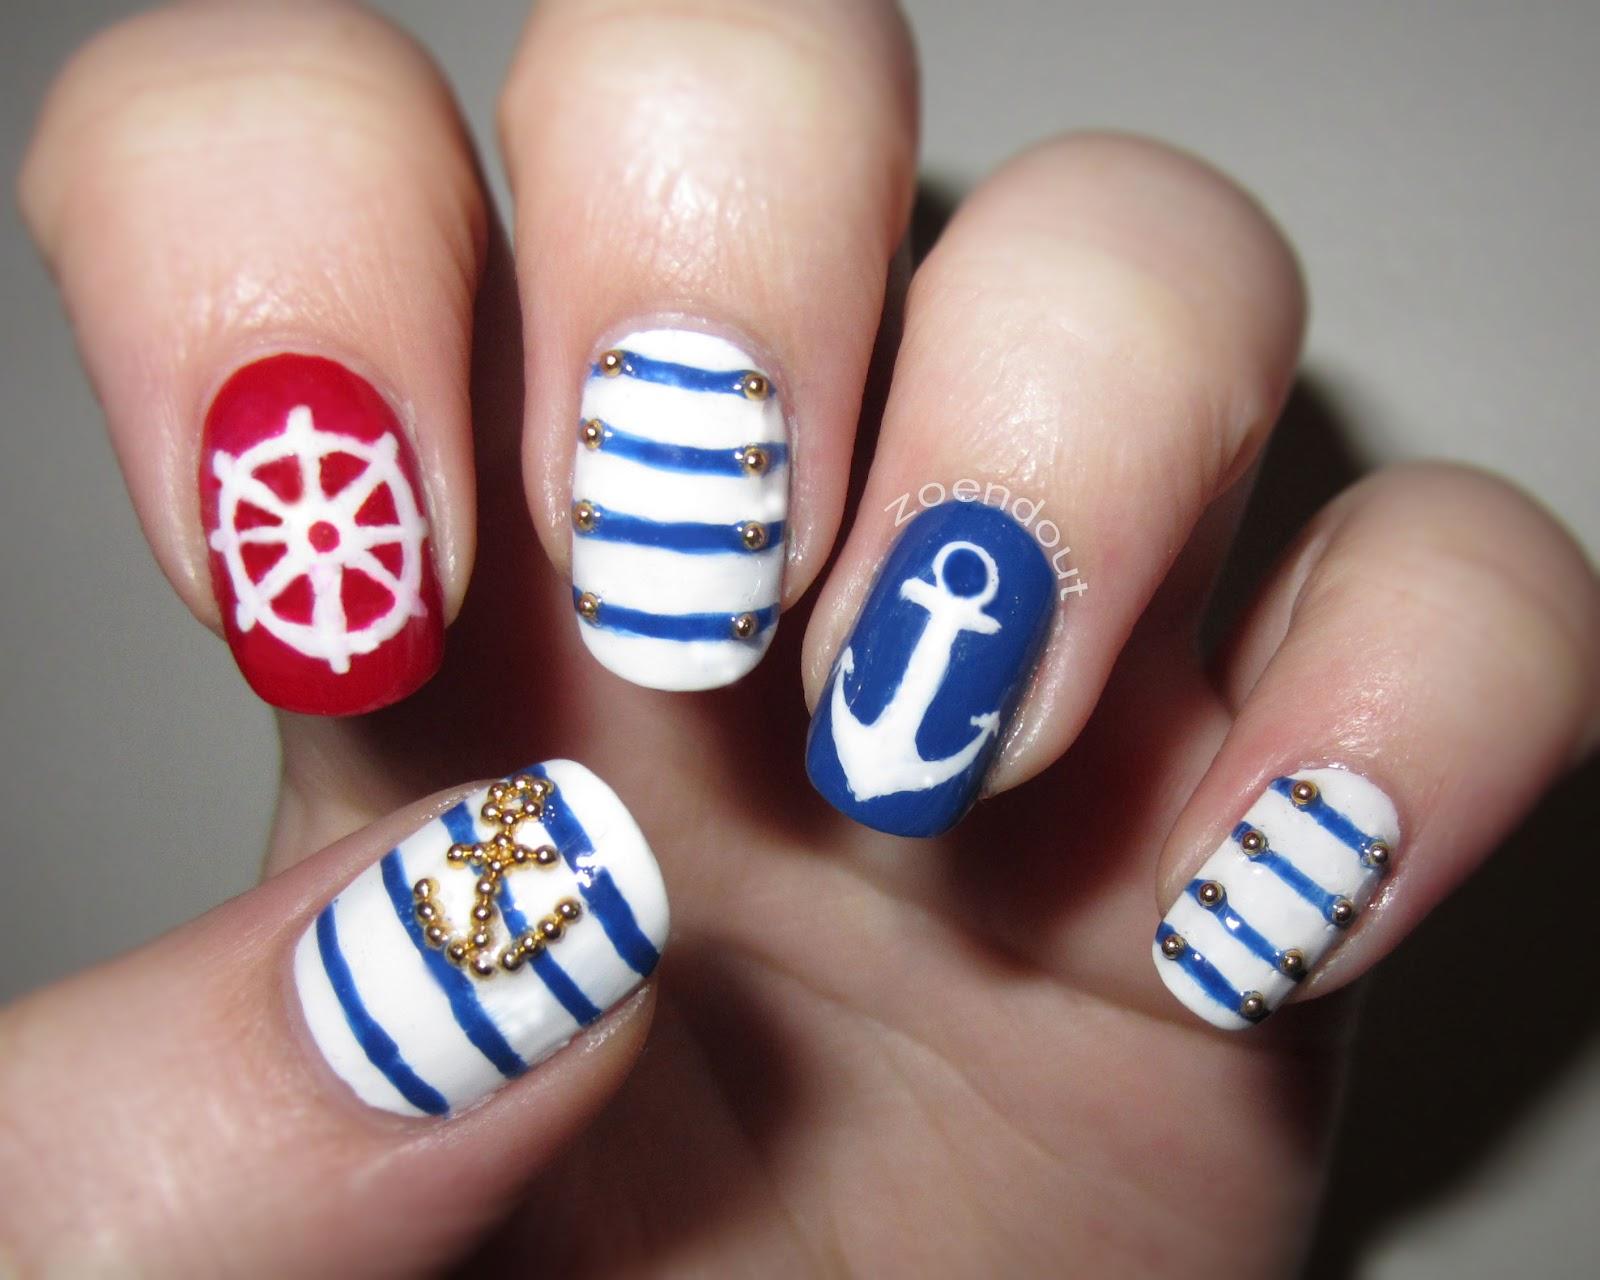 Дизайн ногтей морской тематики фото